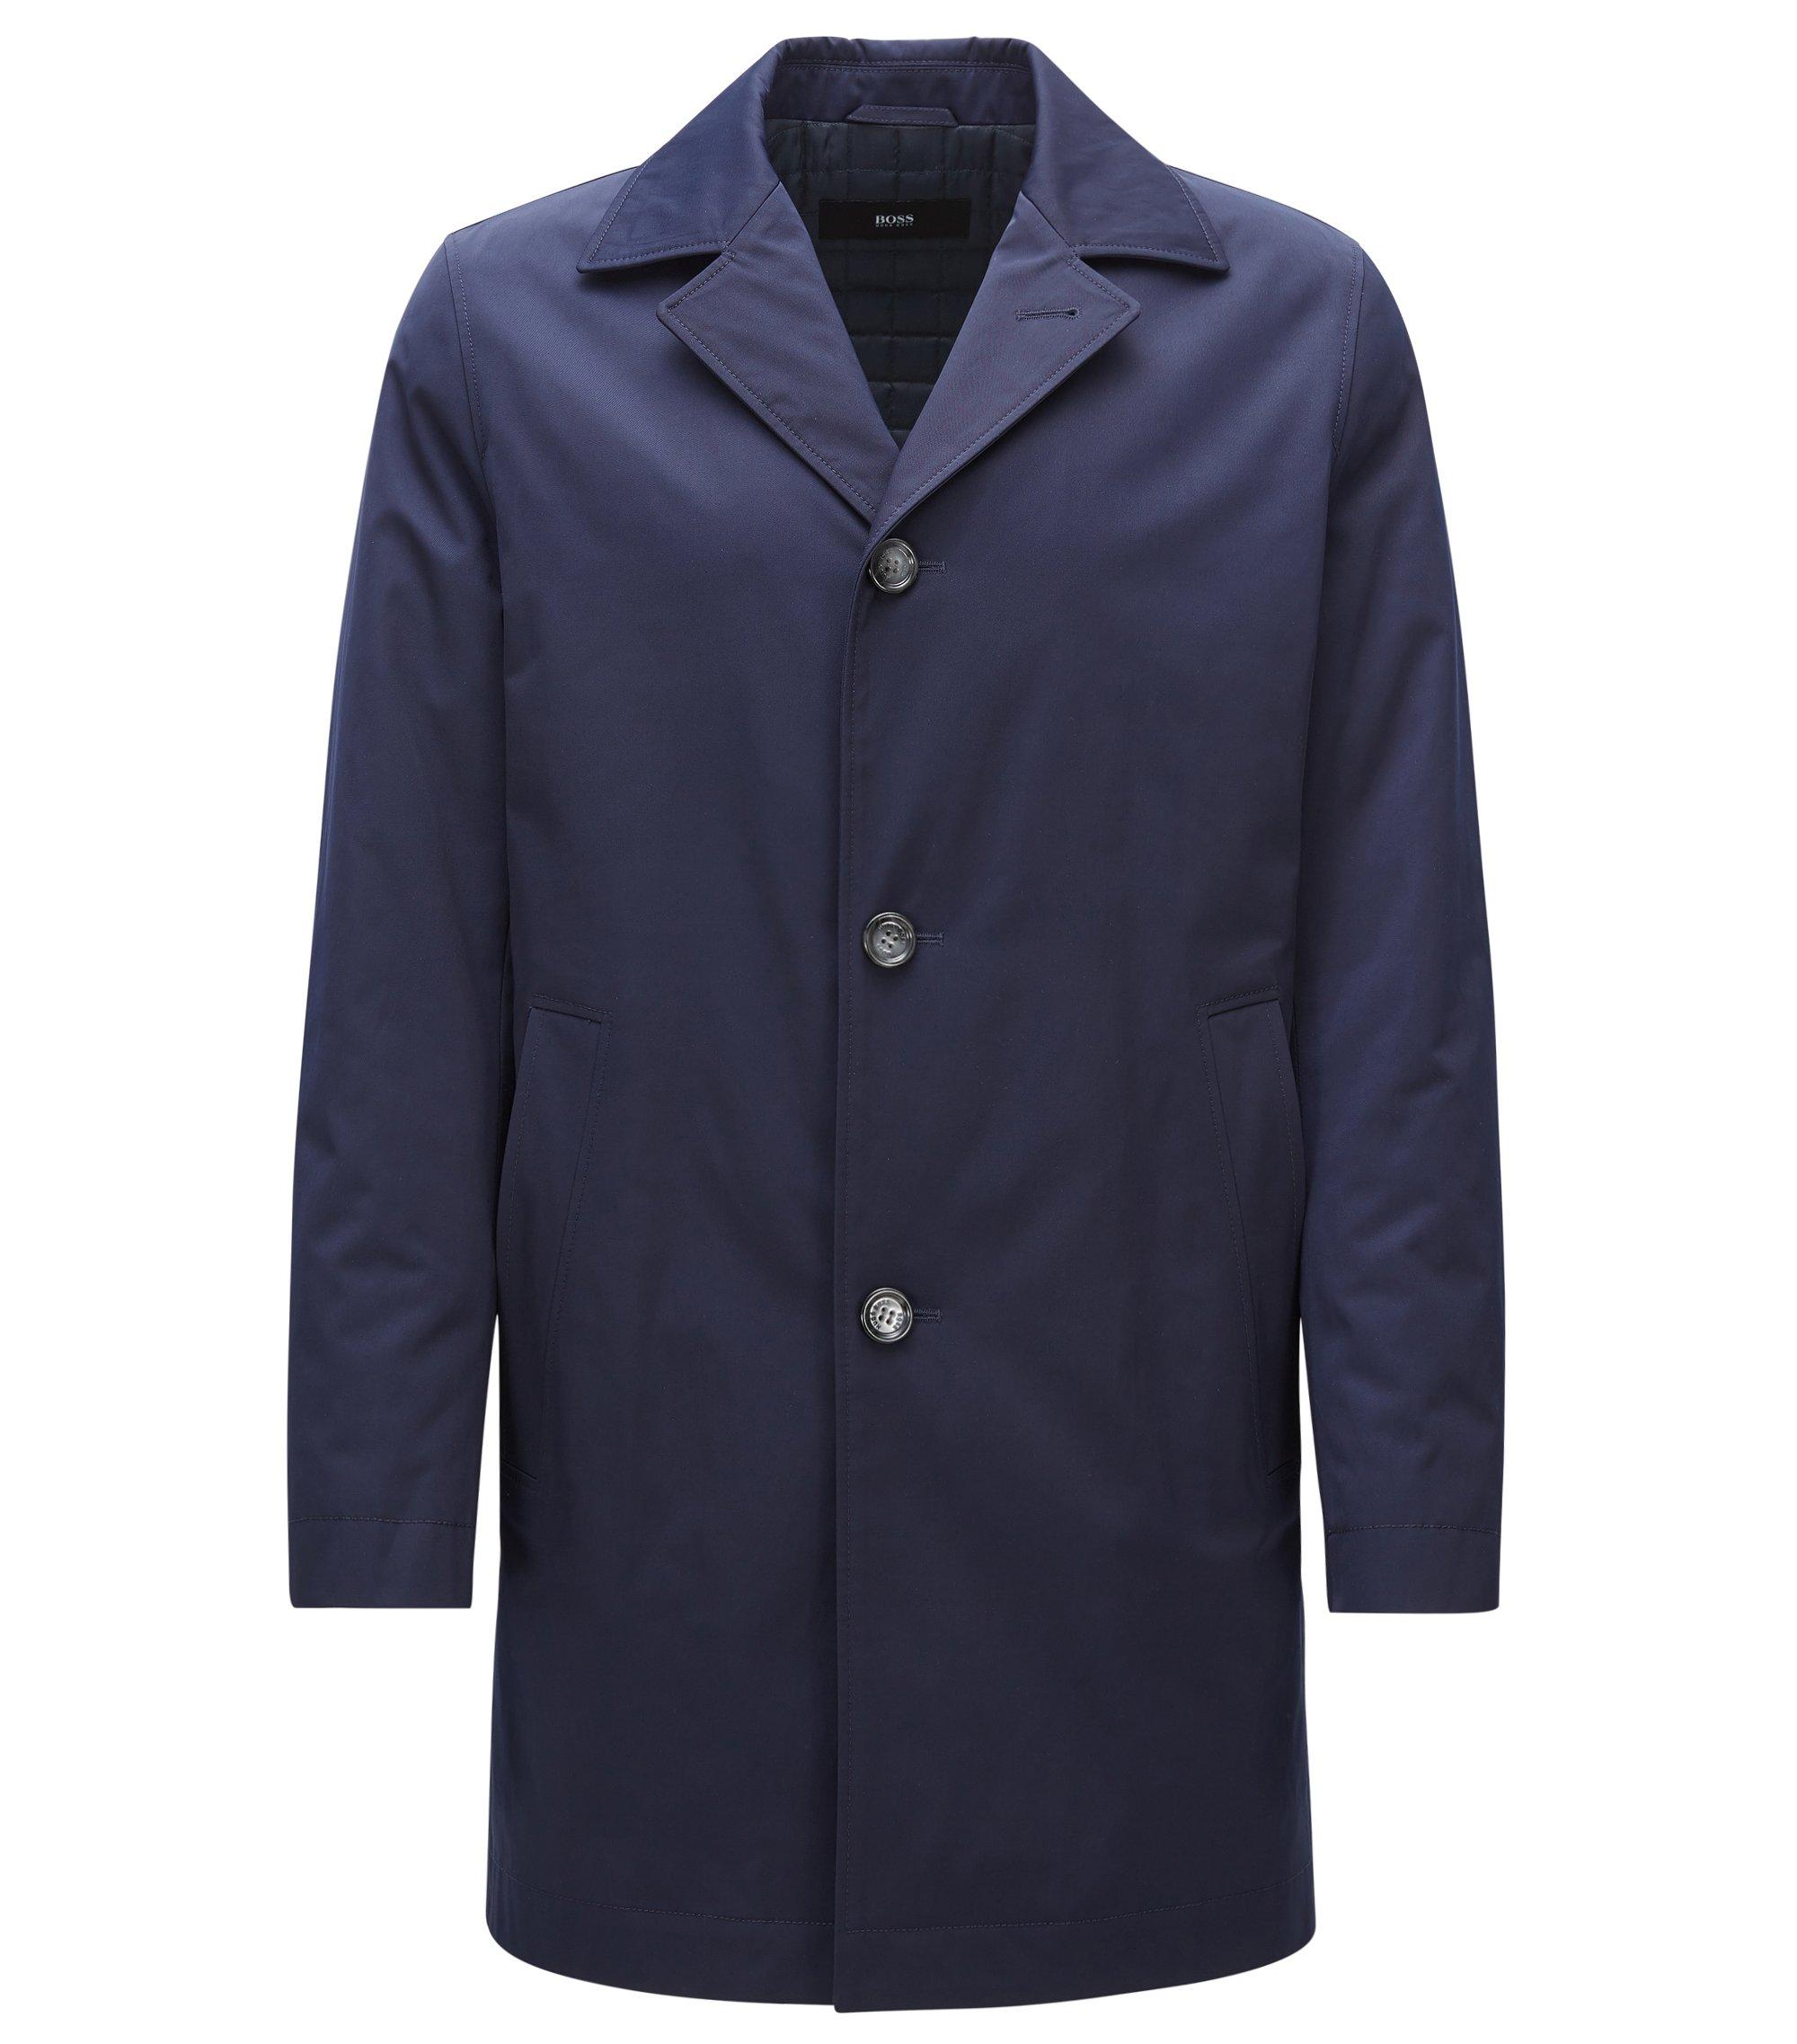 Abrigo ligeramente acolchado en tejido de peso medio, Azul oscuro